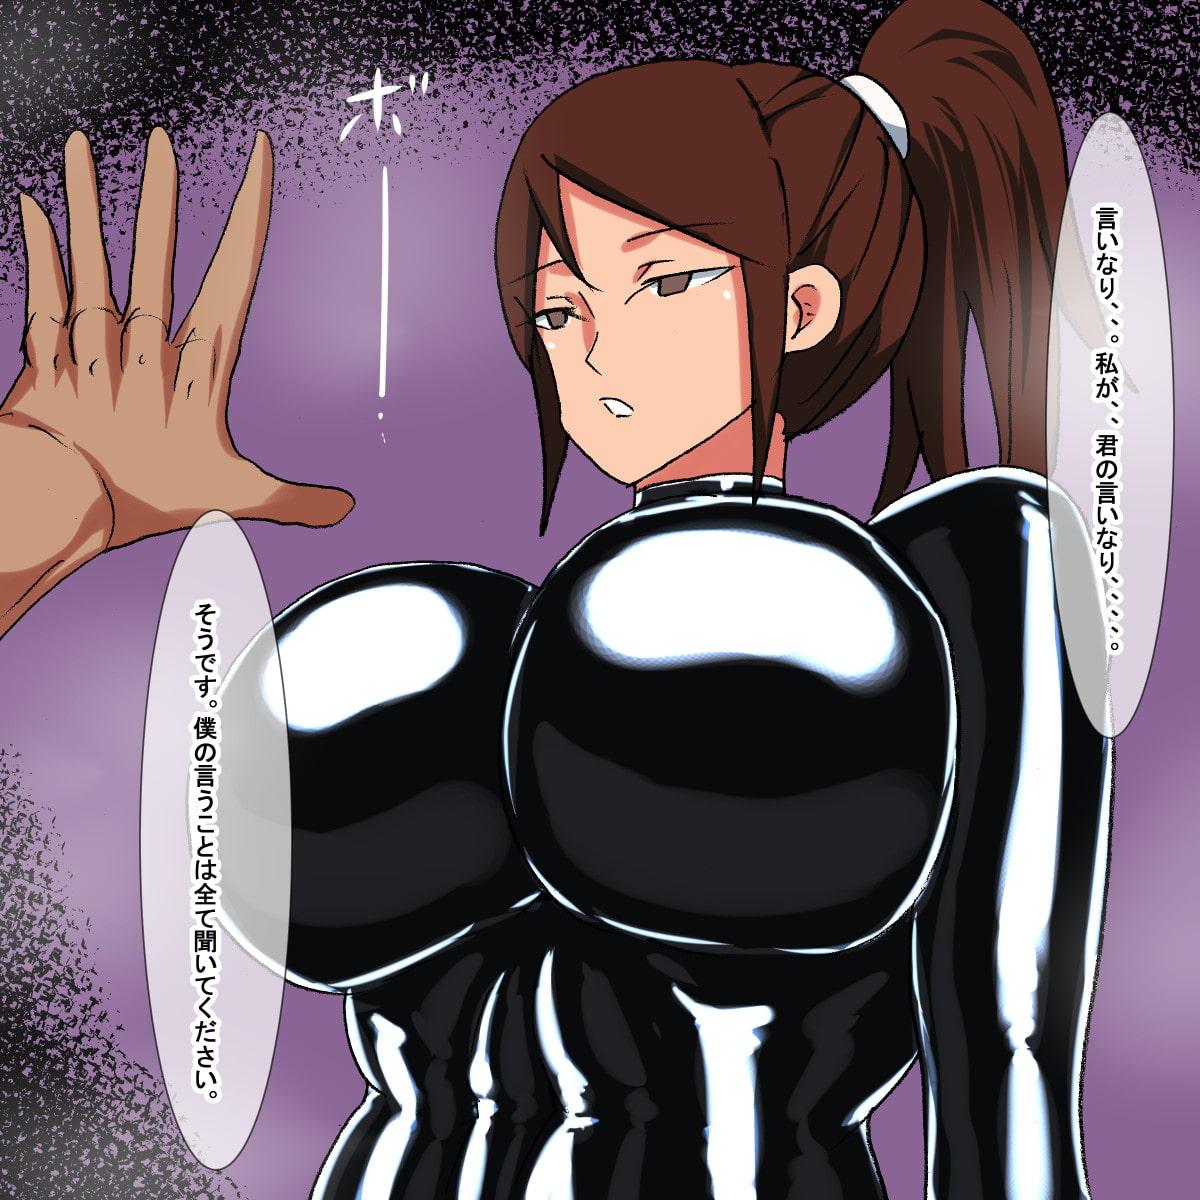 RJ325150 ms ラバースーツ女スパイ催眠O辱 [20210424]